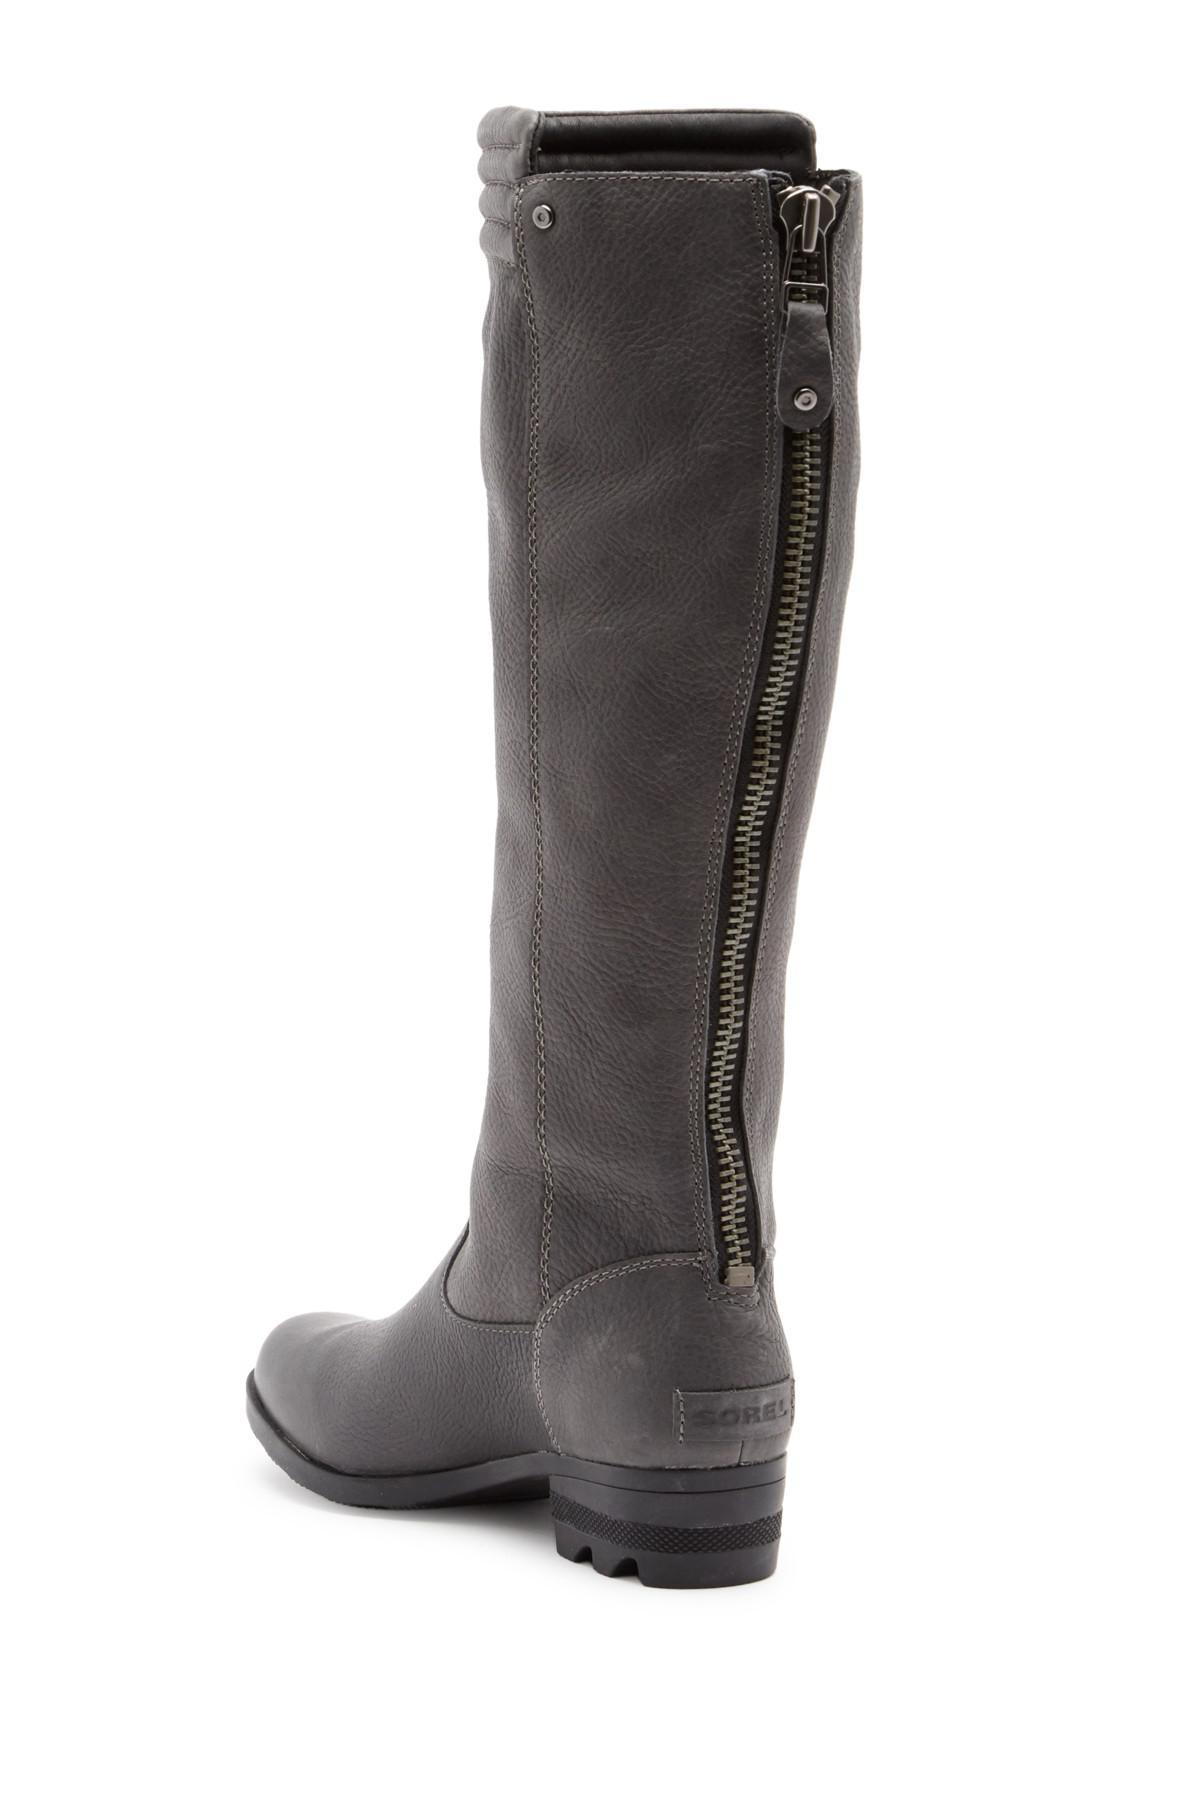 Sorel Danica Tall Waterproof Leather